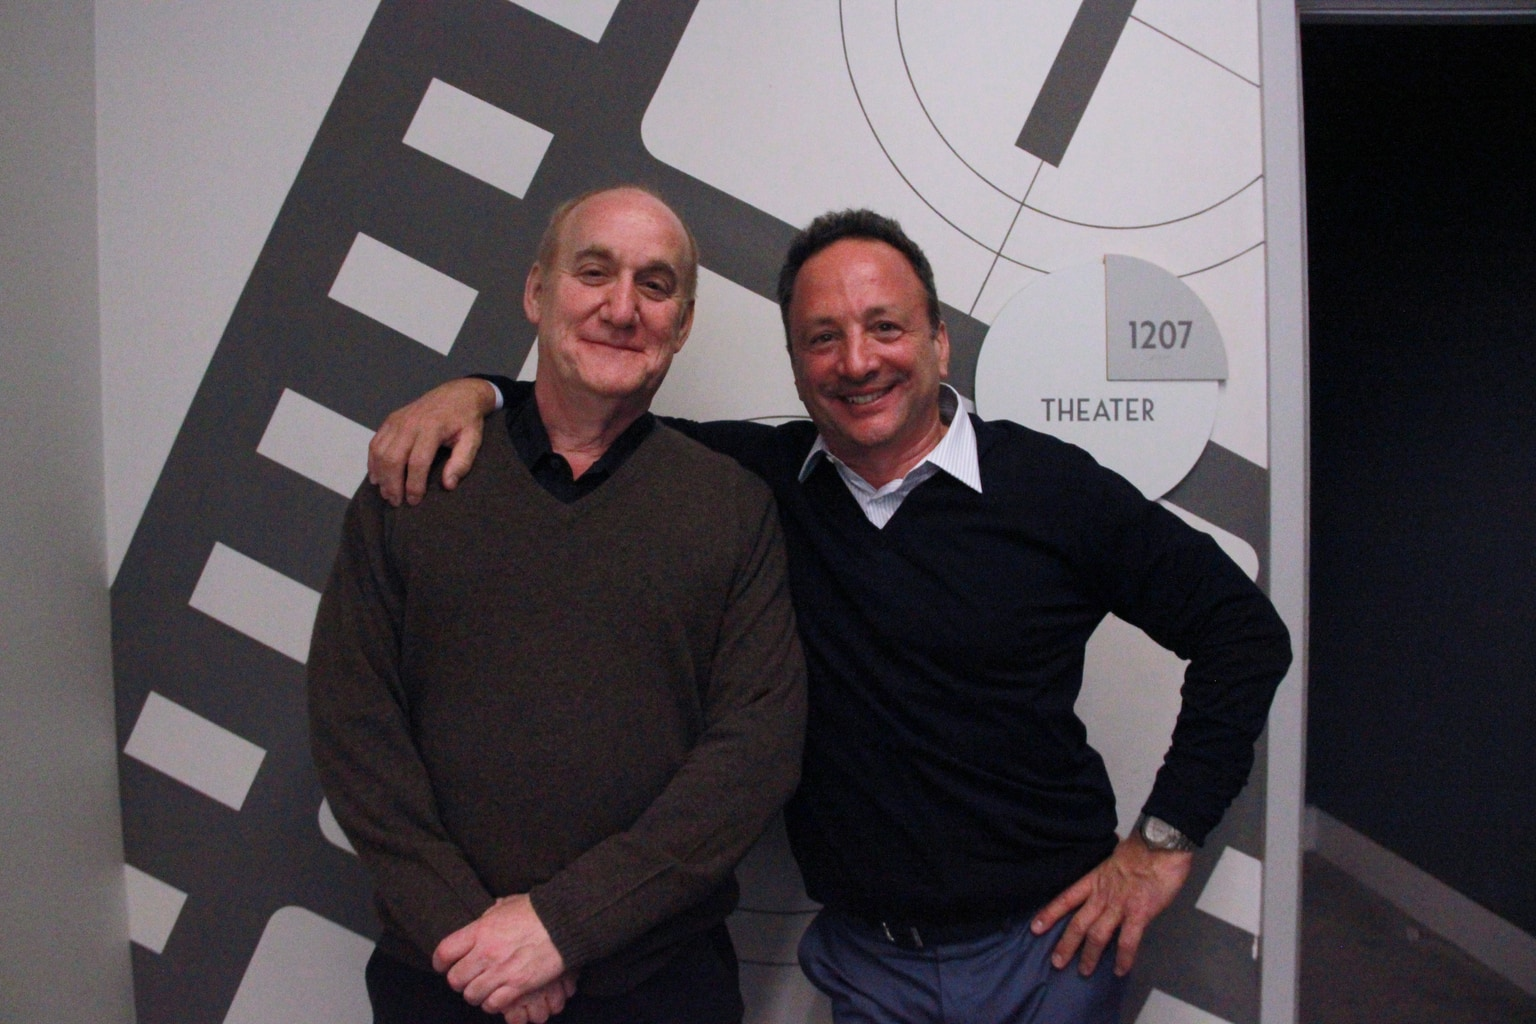 Louis D'Esposito & Jeph Loeb